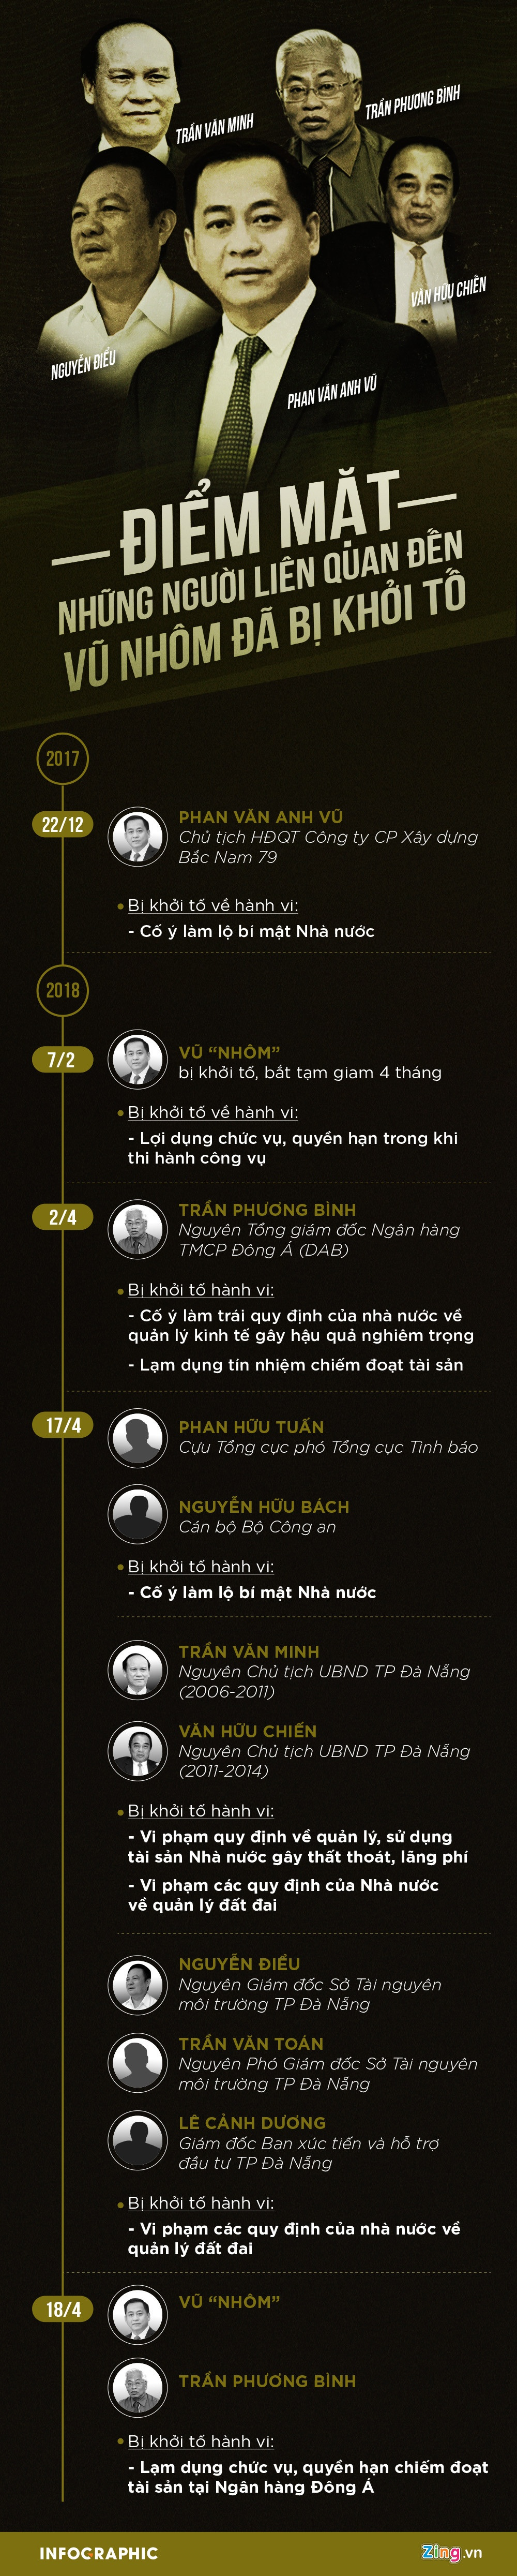 Cuu Chu tich Da Nang anh 5